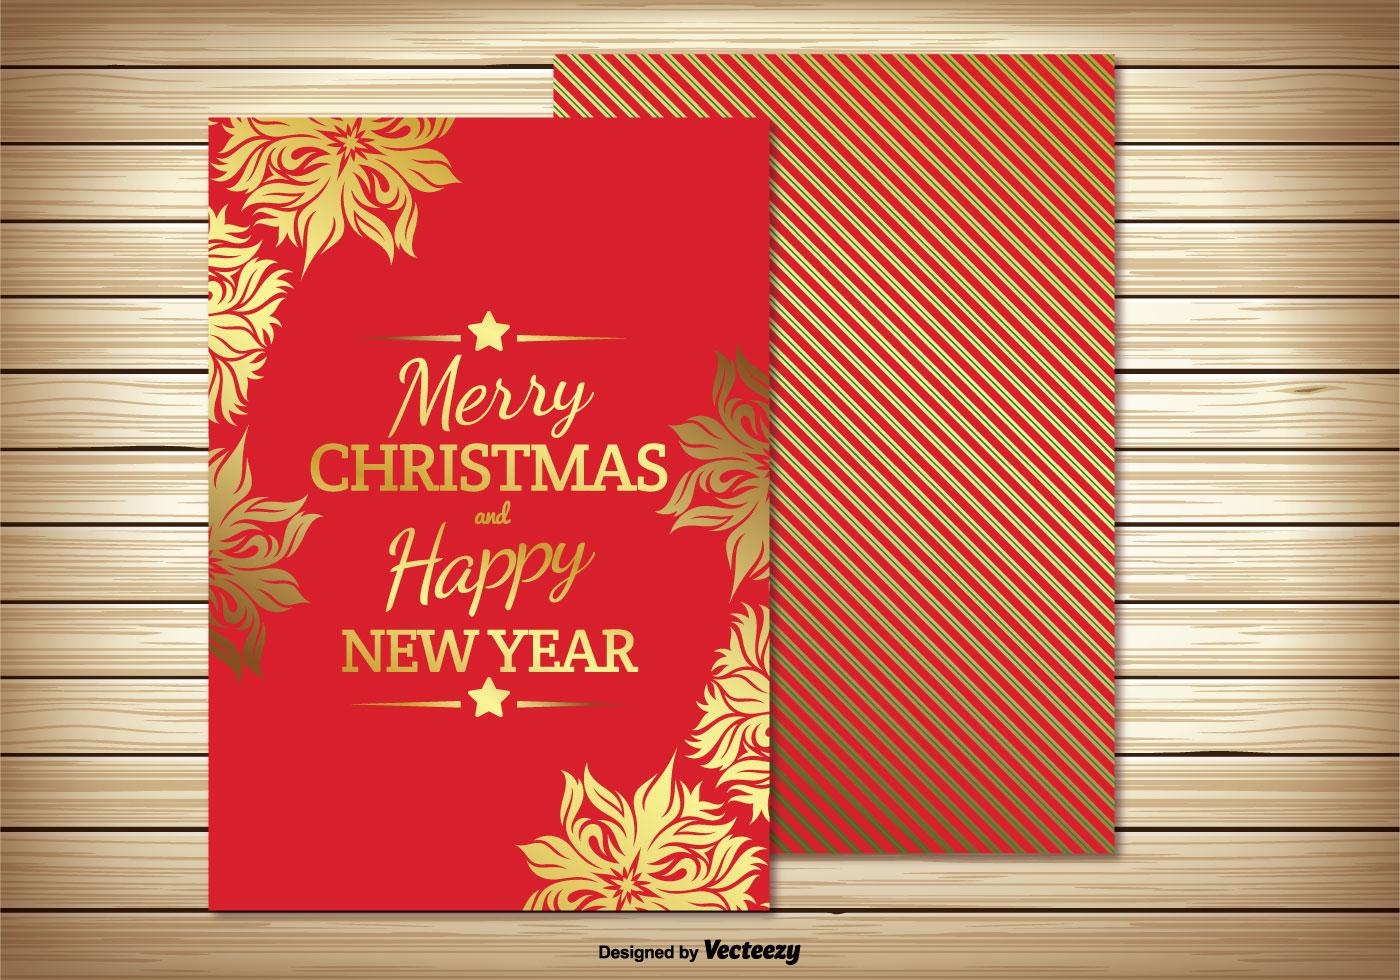 Christmas Card Illustration Download Free Vector Art